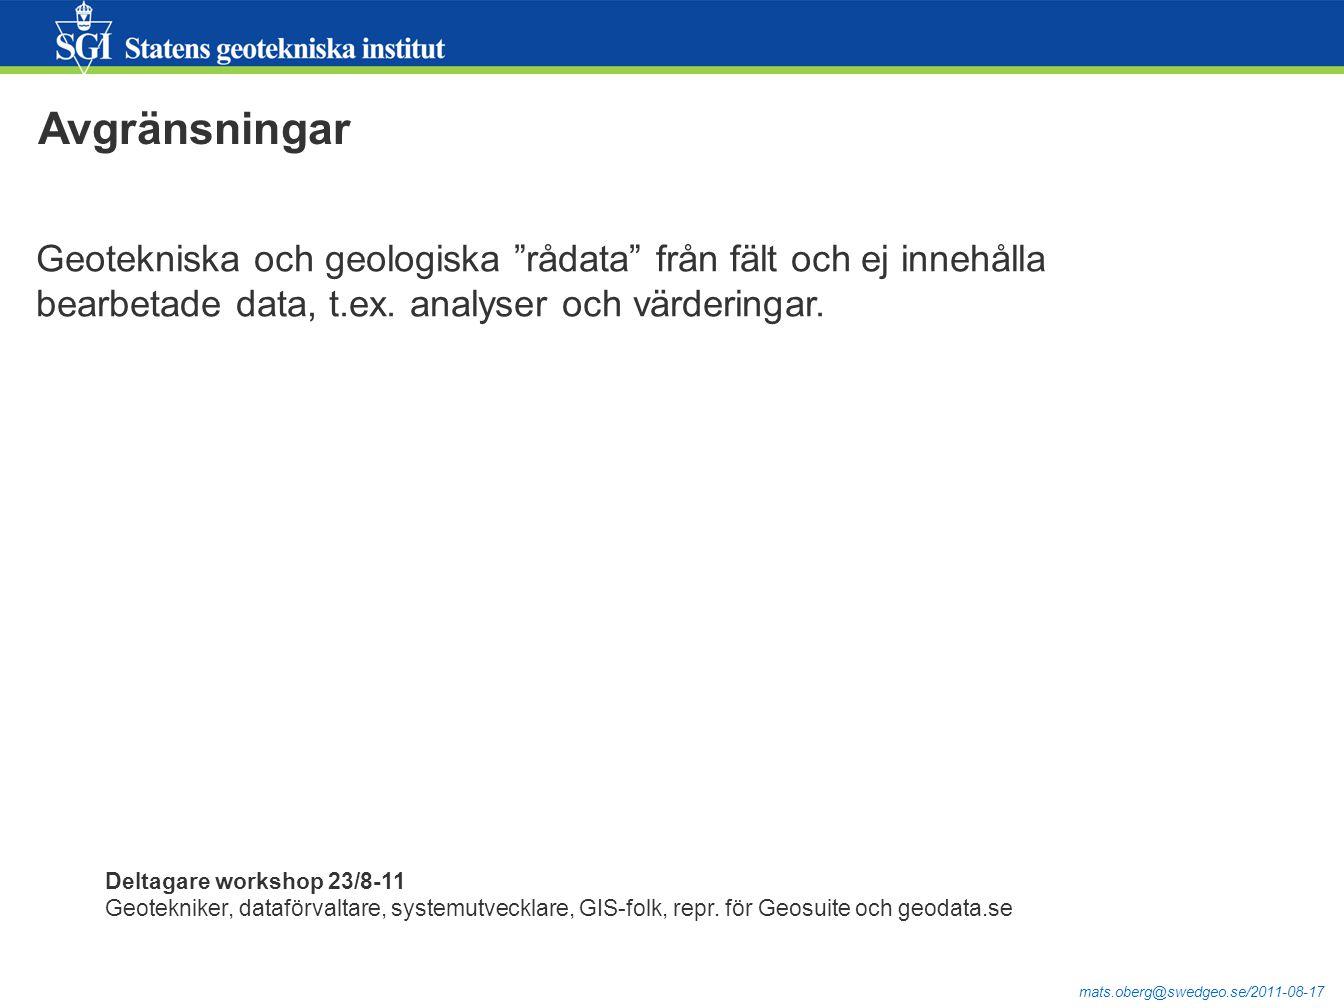 mats.oberg@swedgeo.se/2011-08-17 Exponering i Geoteknisk sektorsportal (del av geodata.se) Gås igenom i annan presentation… http://gis.swedgeo.se/startgsp/http://gis.swedgeo.se/startgsp/  http://ver.geodata.se/GeodataExplorer/?site=Geoteknikhttp://ver.geodata.se/GeodataExplorer/?site=Geoteknik